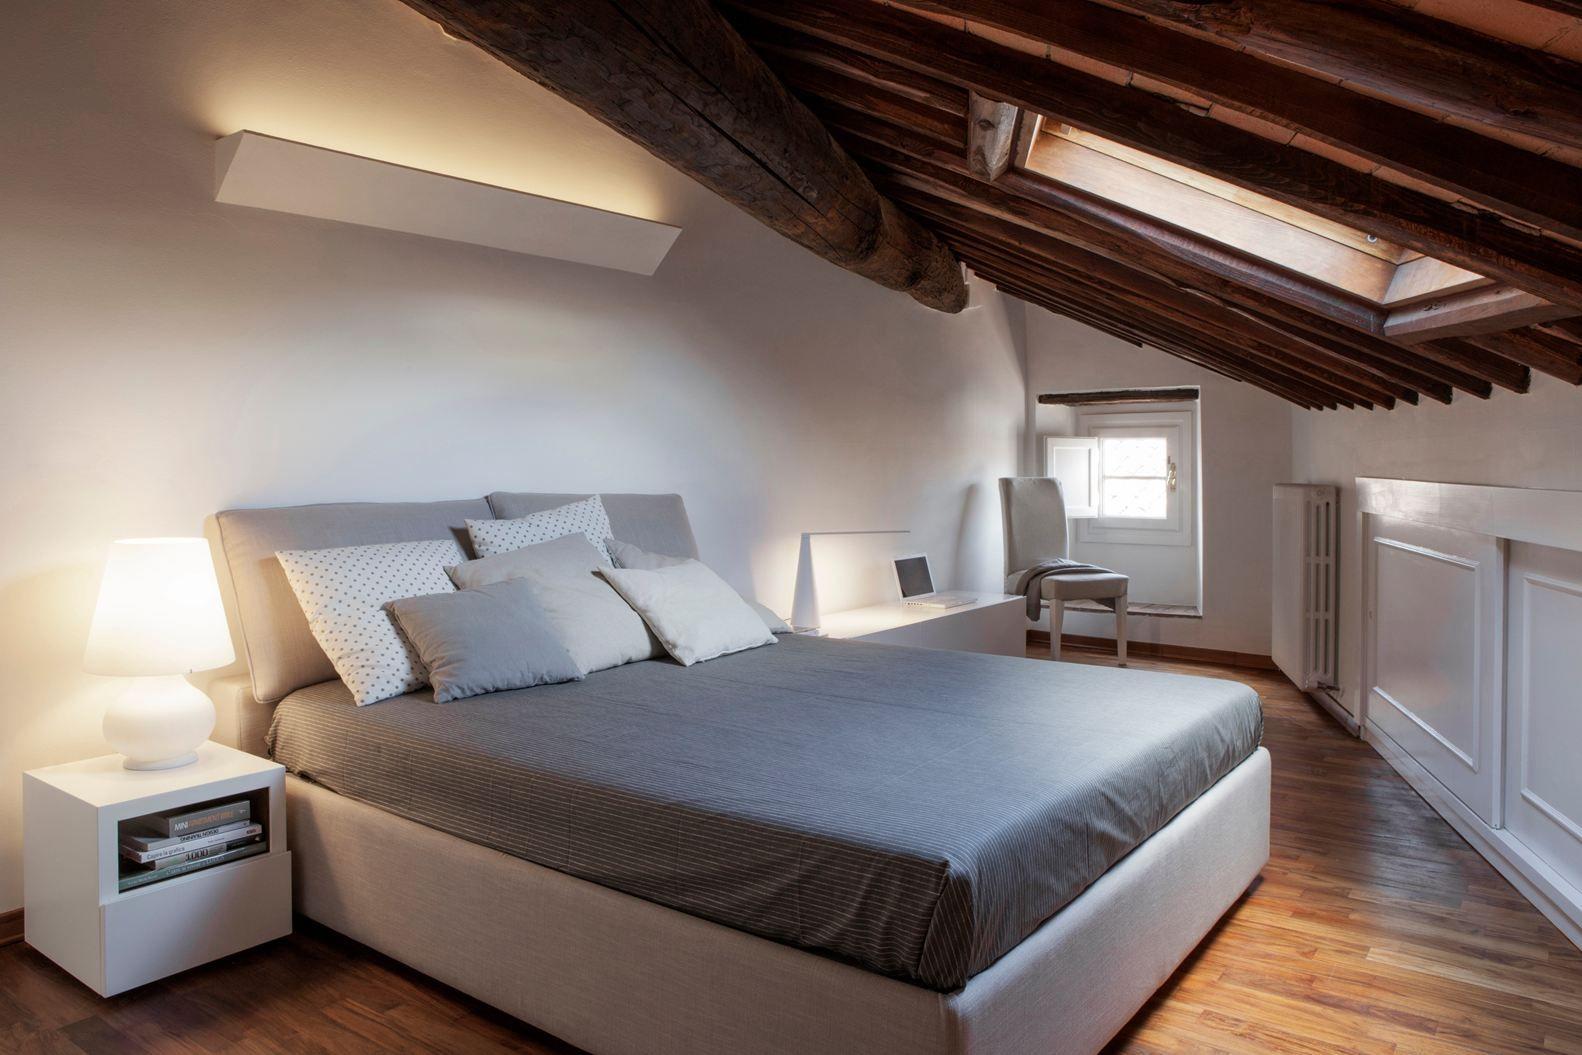 Idee Arredamento Casa & Interior Design | Interior design, Moderno e ...